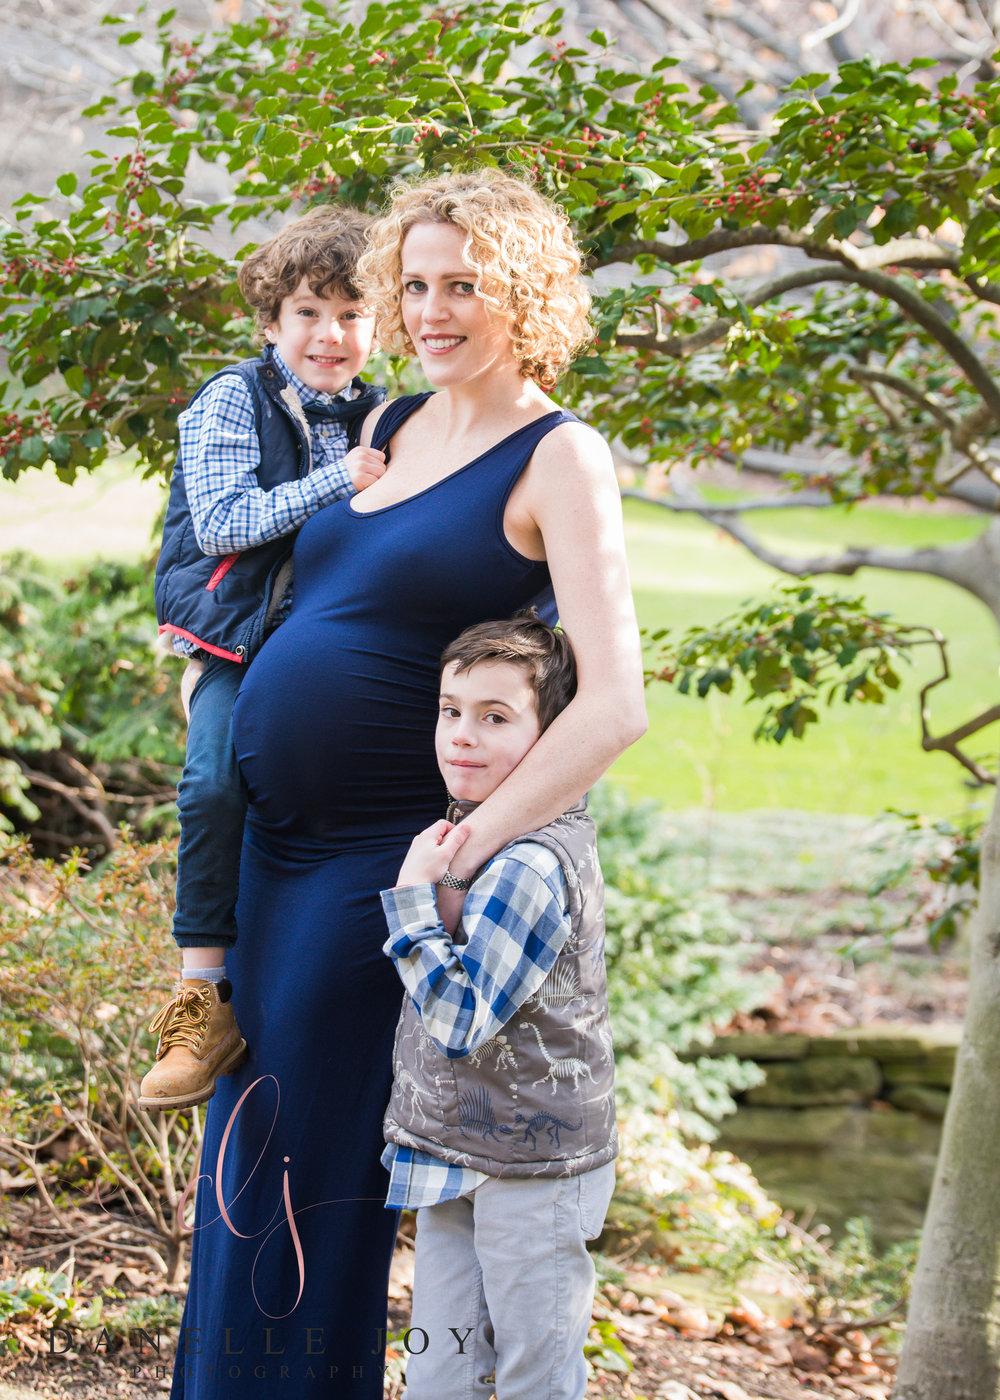 Maternity Session Family Photography Family Photographer Blog